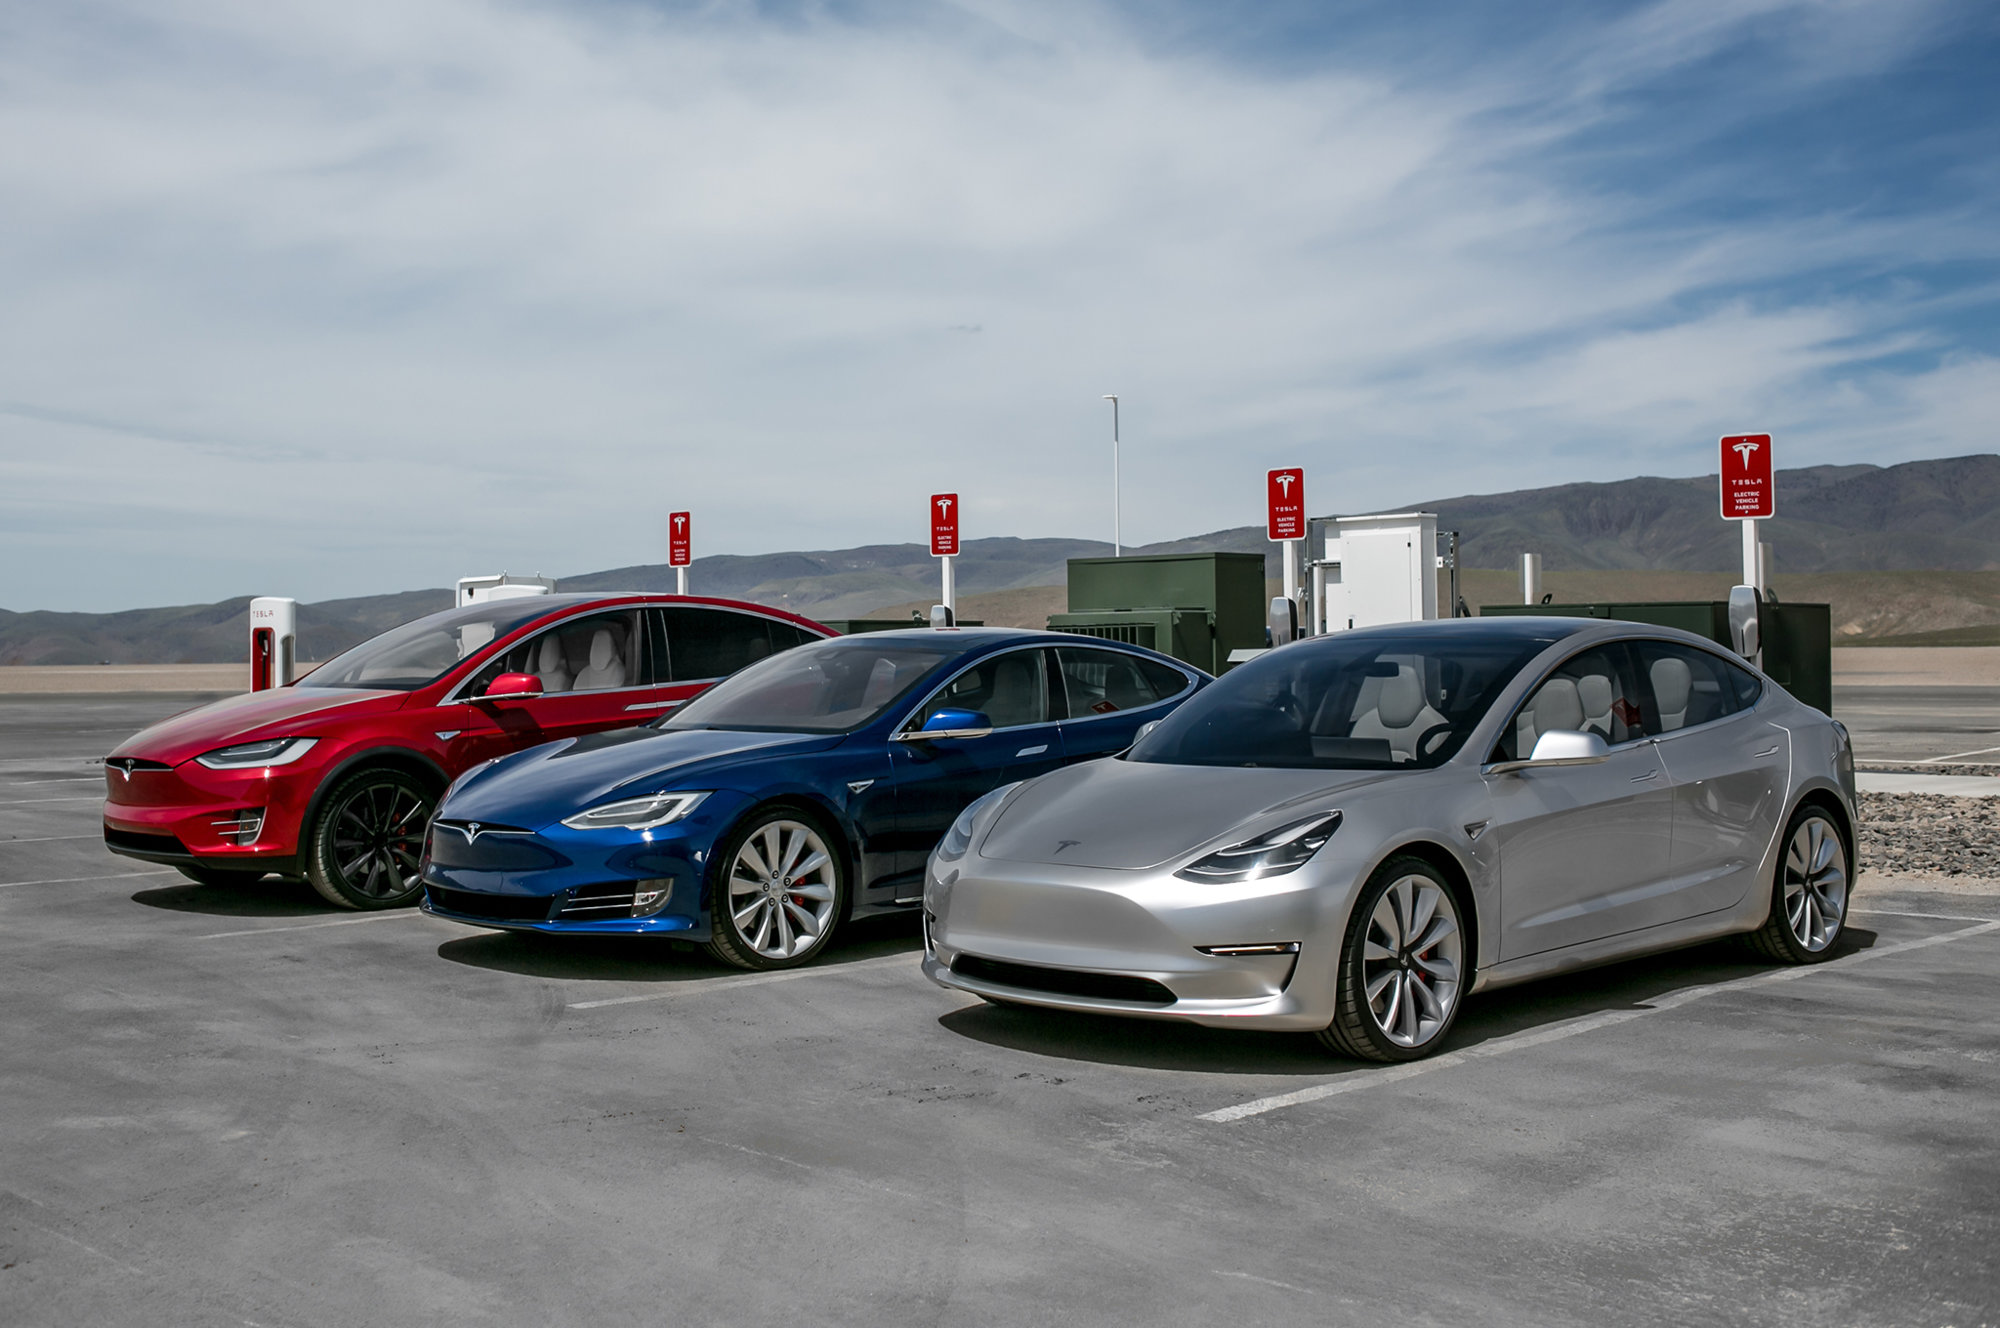 2017-Tesla-Model-3-2016-Tesla-Model-X-Tesla-Model-S-charging-stations.jpg